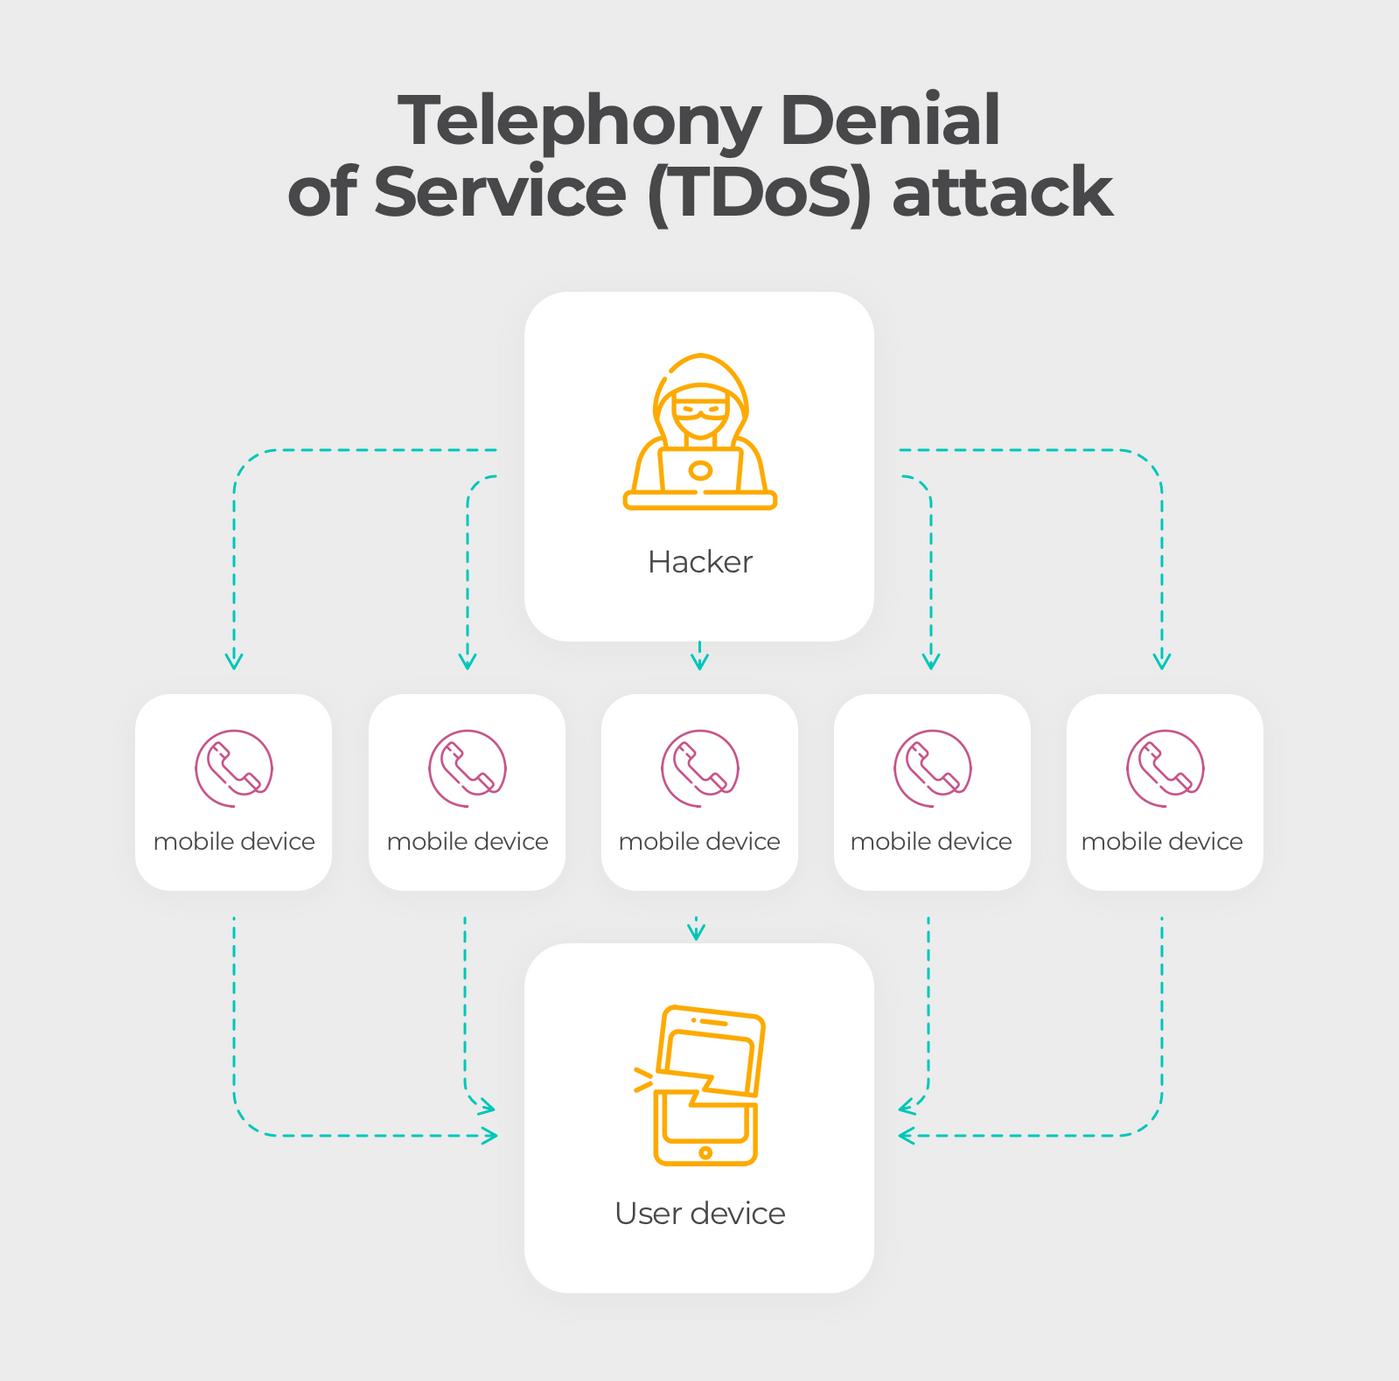 Cellular network vulnerabilities: TDoS attack